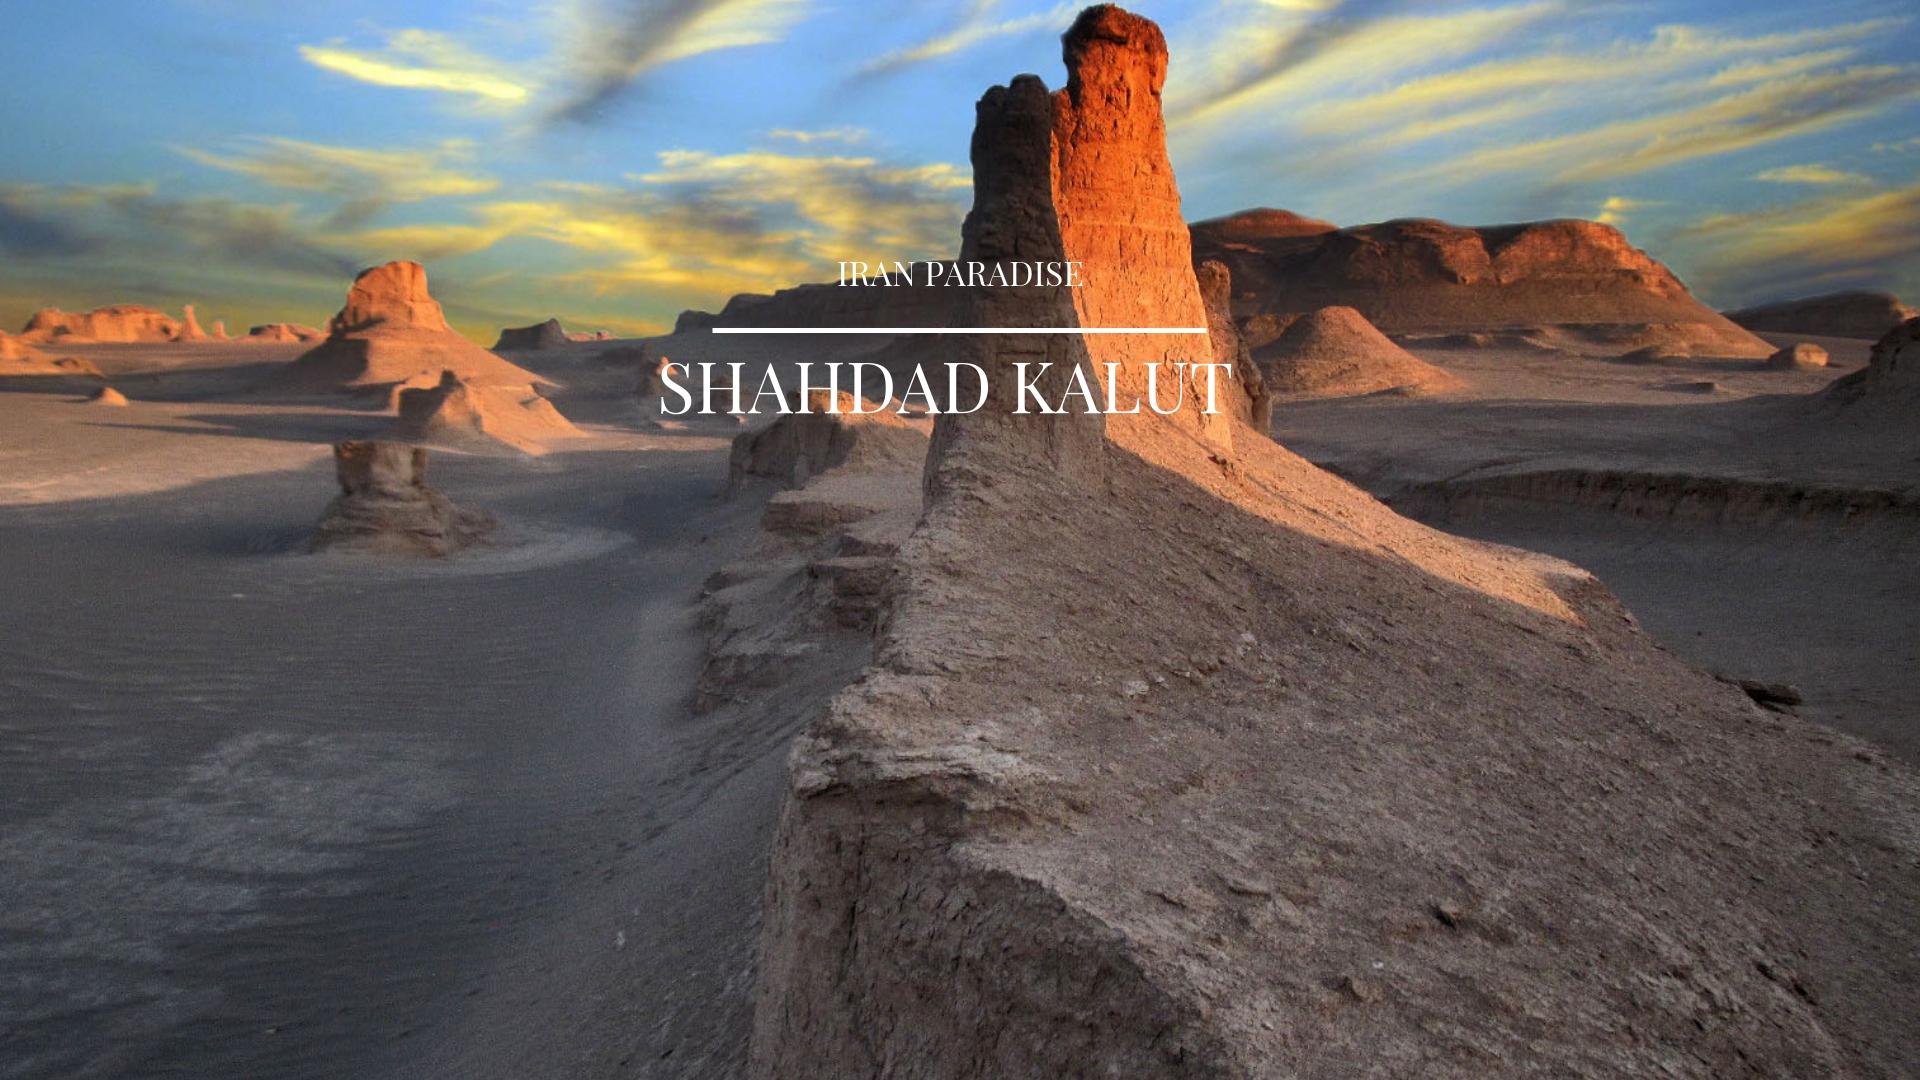 Shahdad Kalut